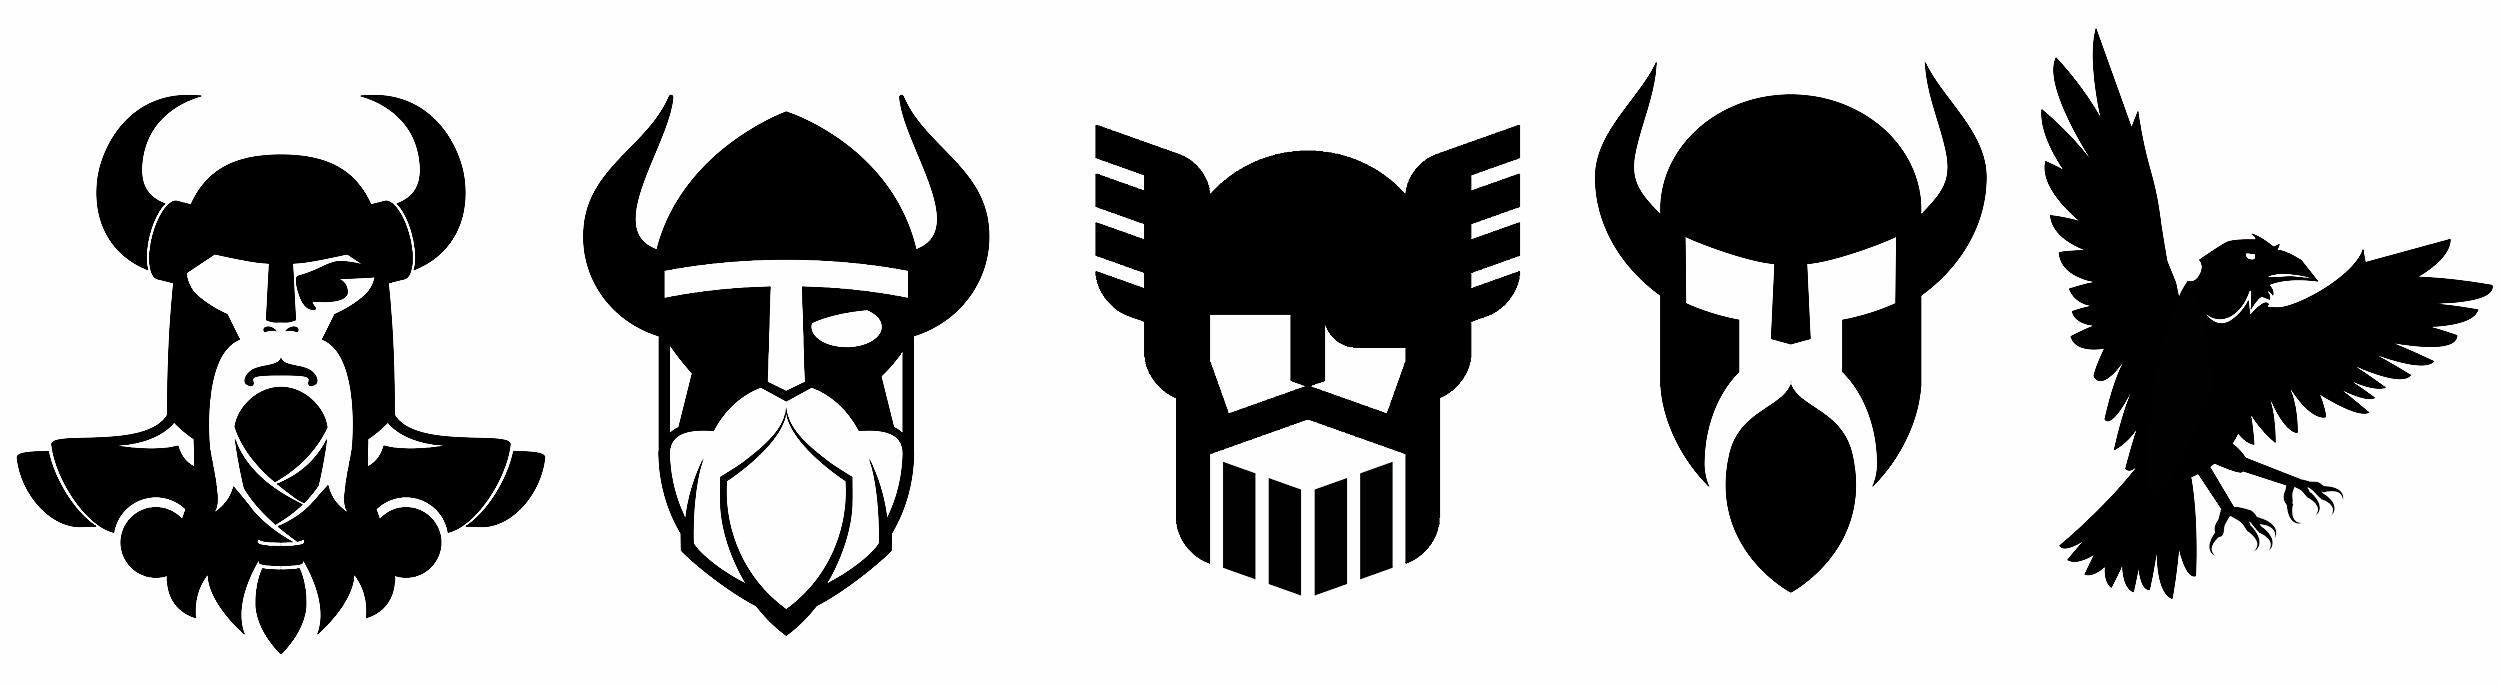 Odin concepts